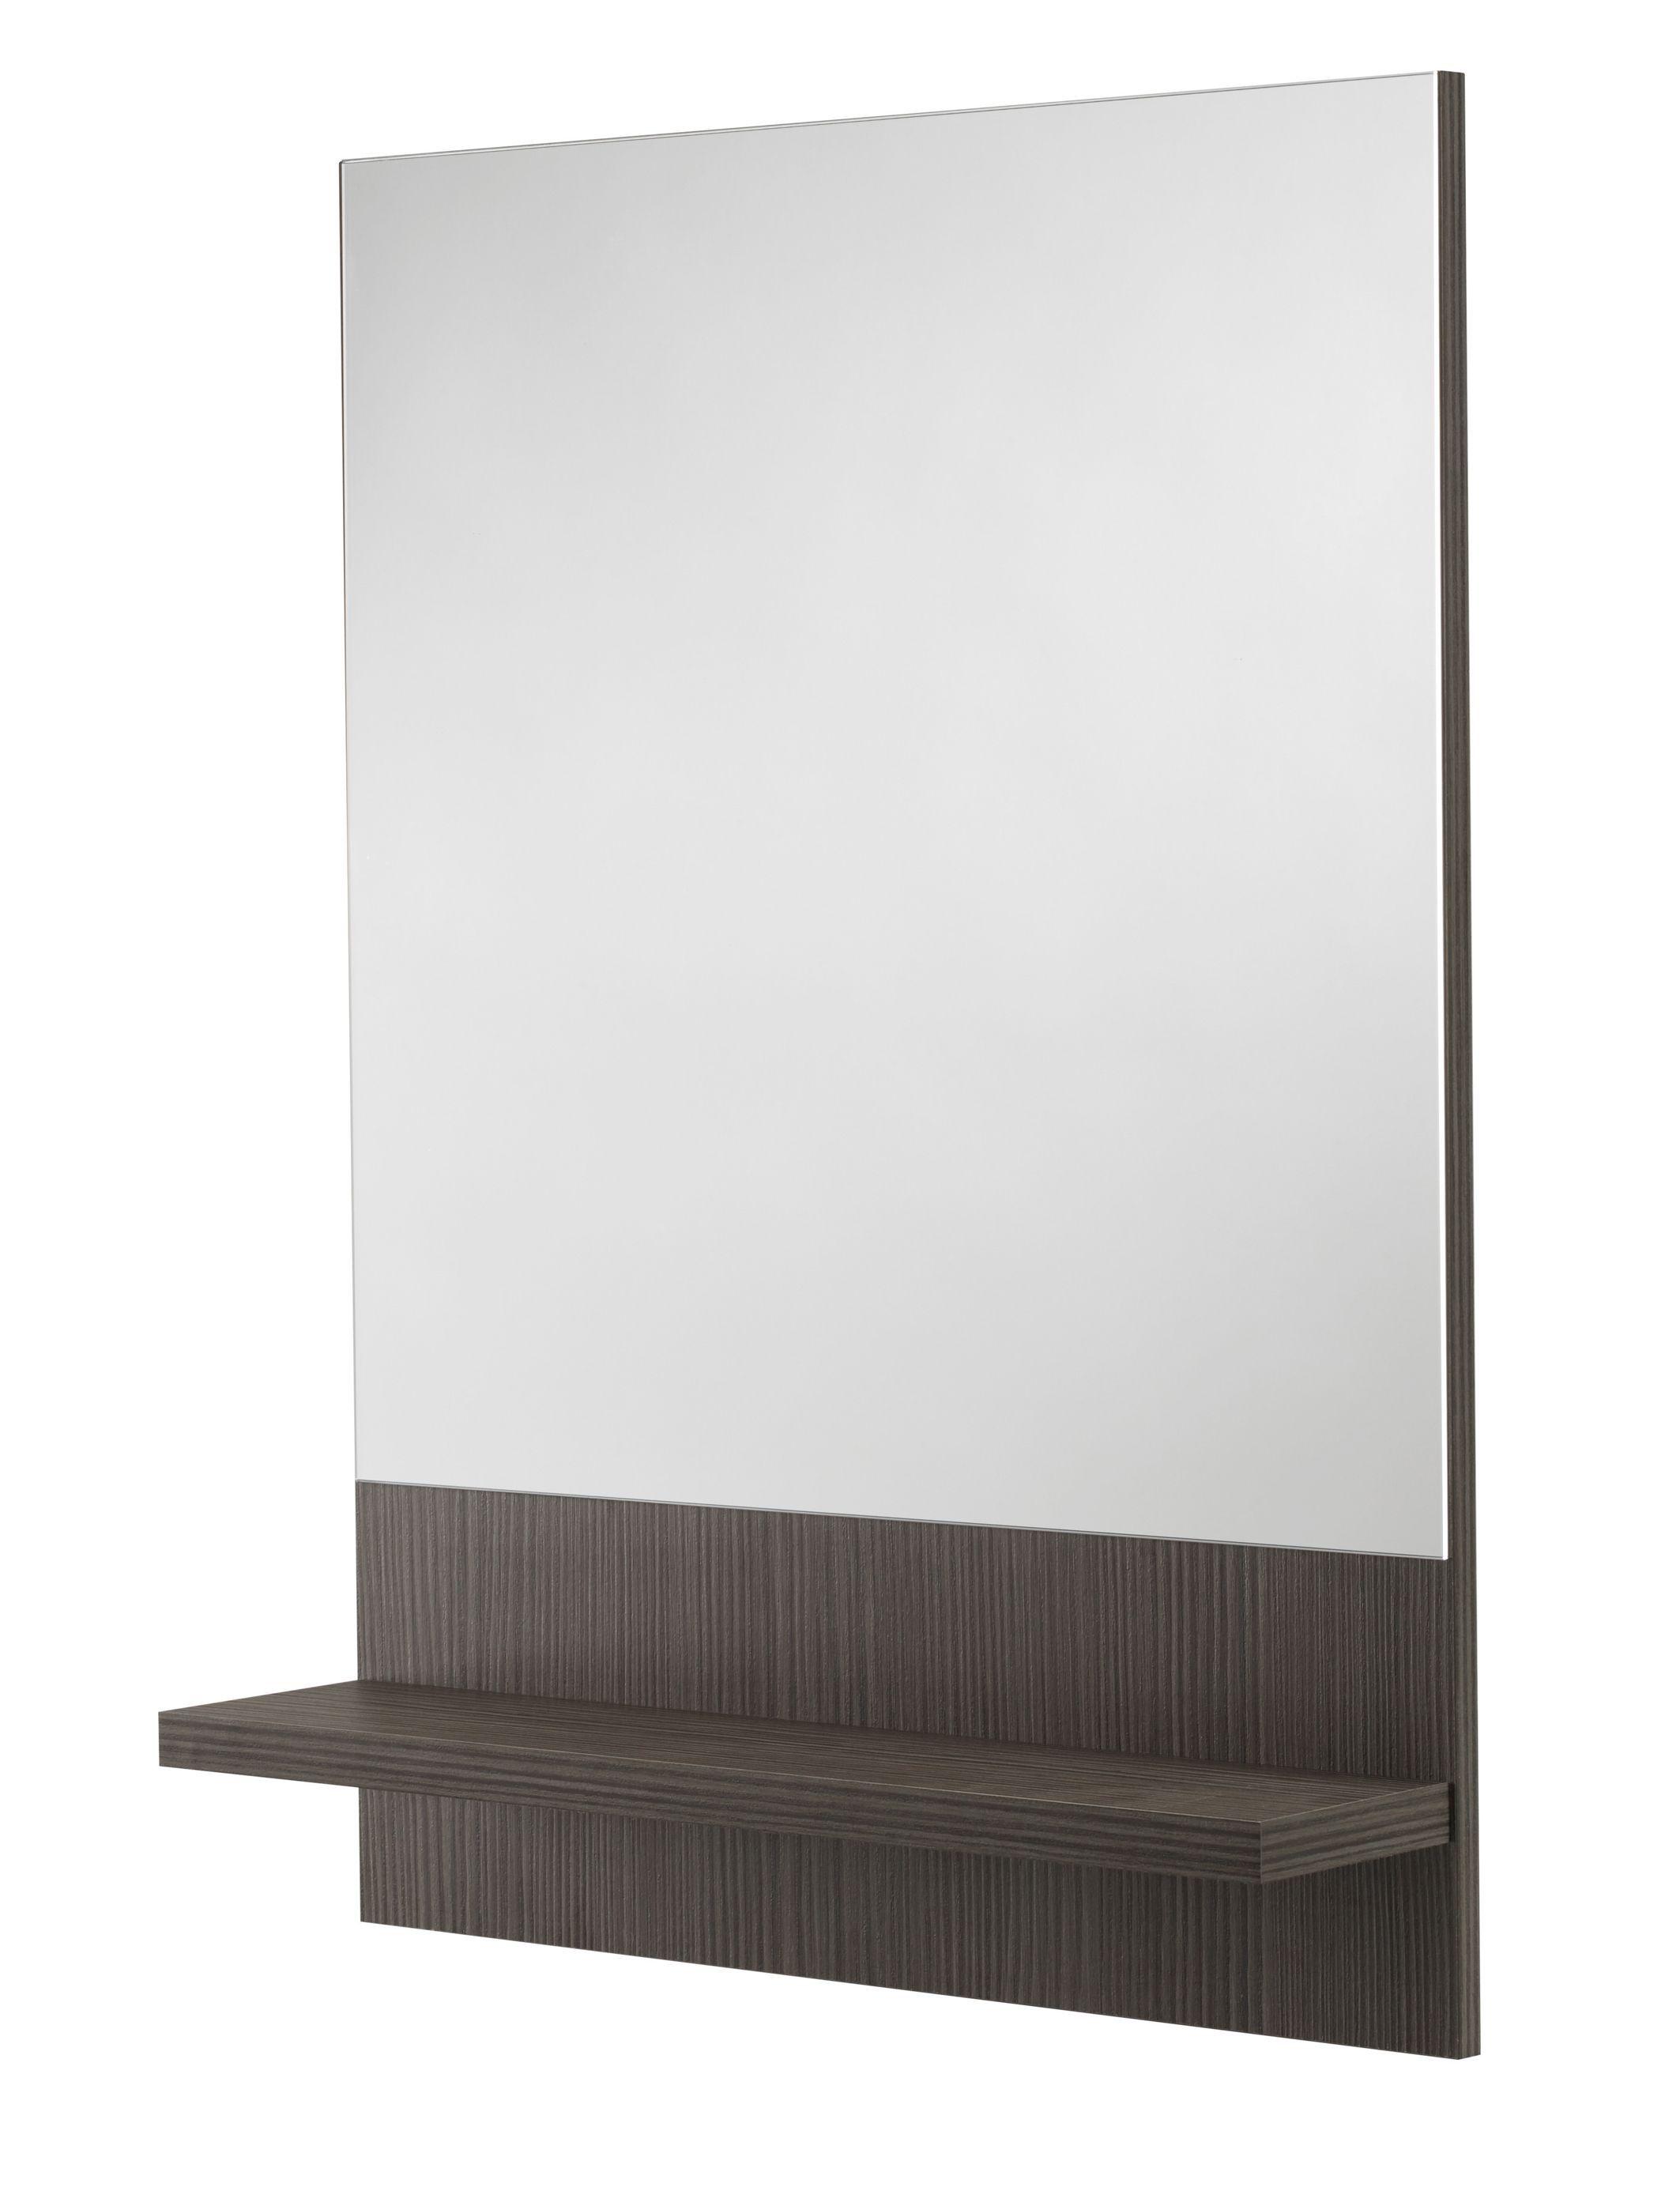 with mountain mijmoj mirror large oak shelf profile storage view